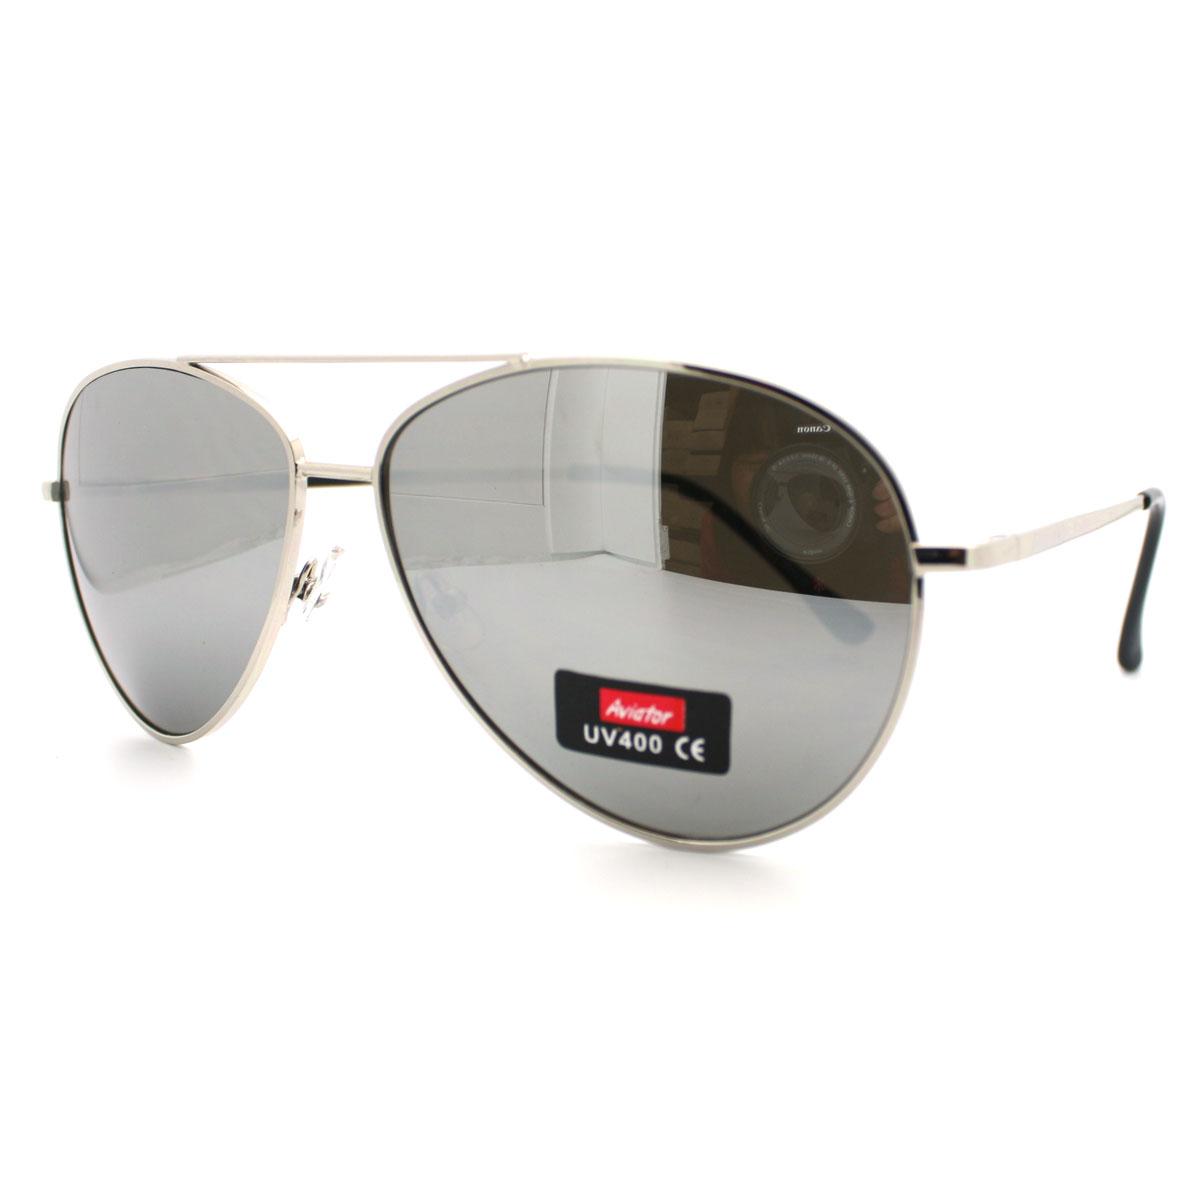 silver aviator sunglasses  Classic Police Style Mirror Lens Aviator Sunglasses w/ Silver ...